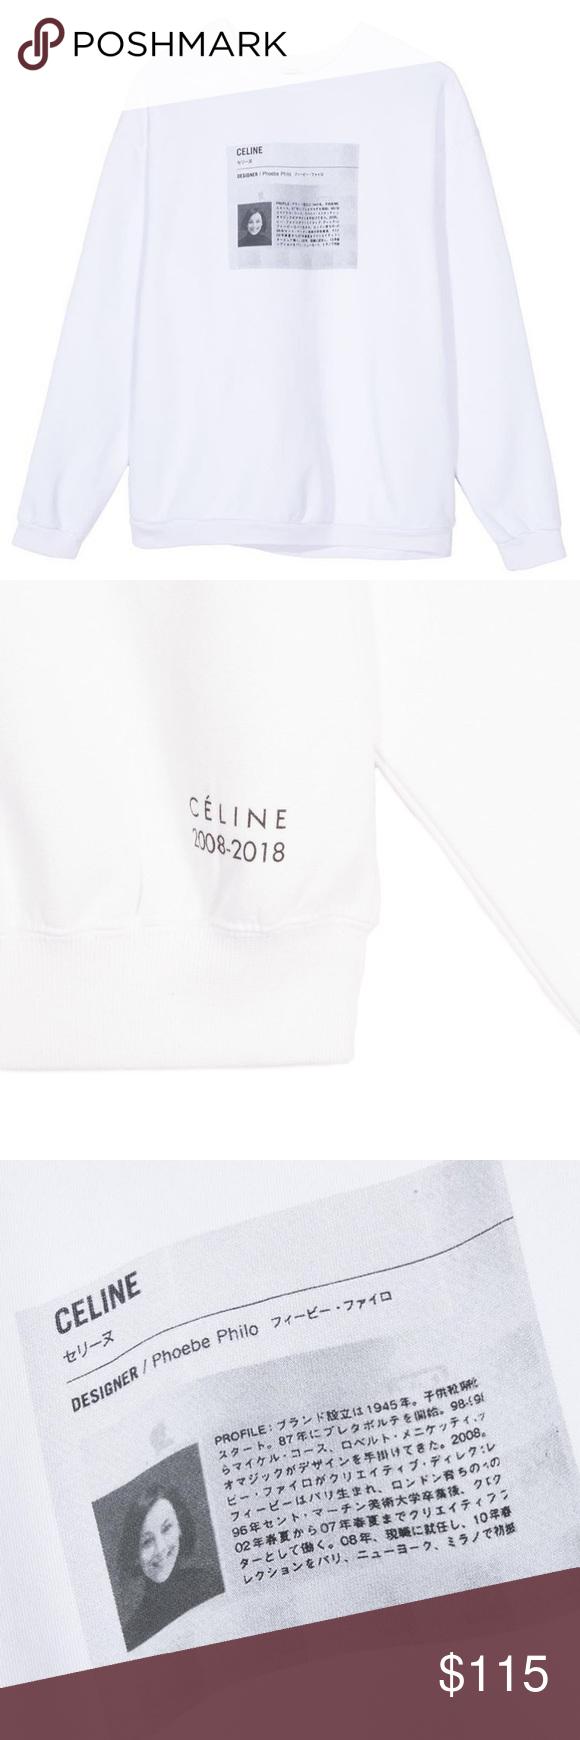 Sold Sporty Rich Celine Phoebe Philo Sweatshirt Sporty And Rich Phoebe Philo Philo [ 1740 x 580 Pixel ]